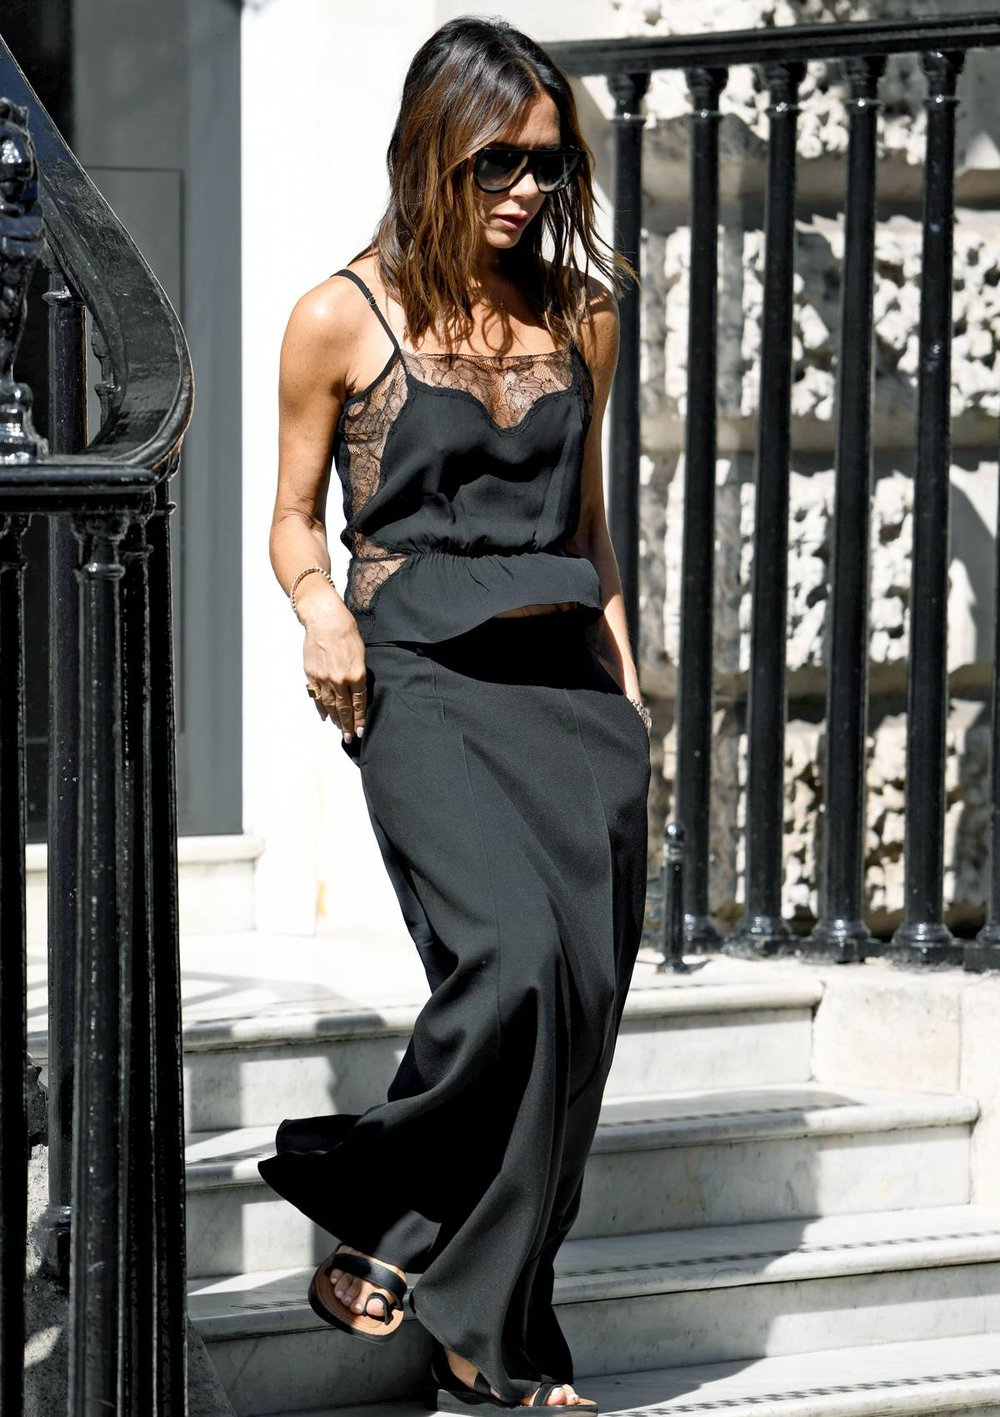 Victoria Beckham's Black Slip Dress Moment - Get the look HERE